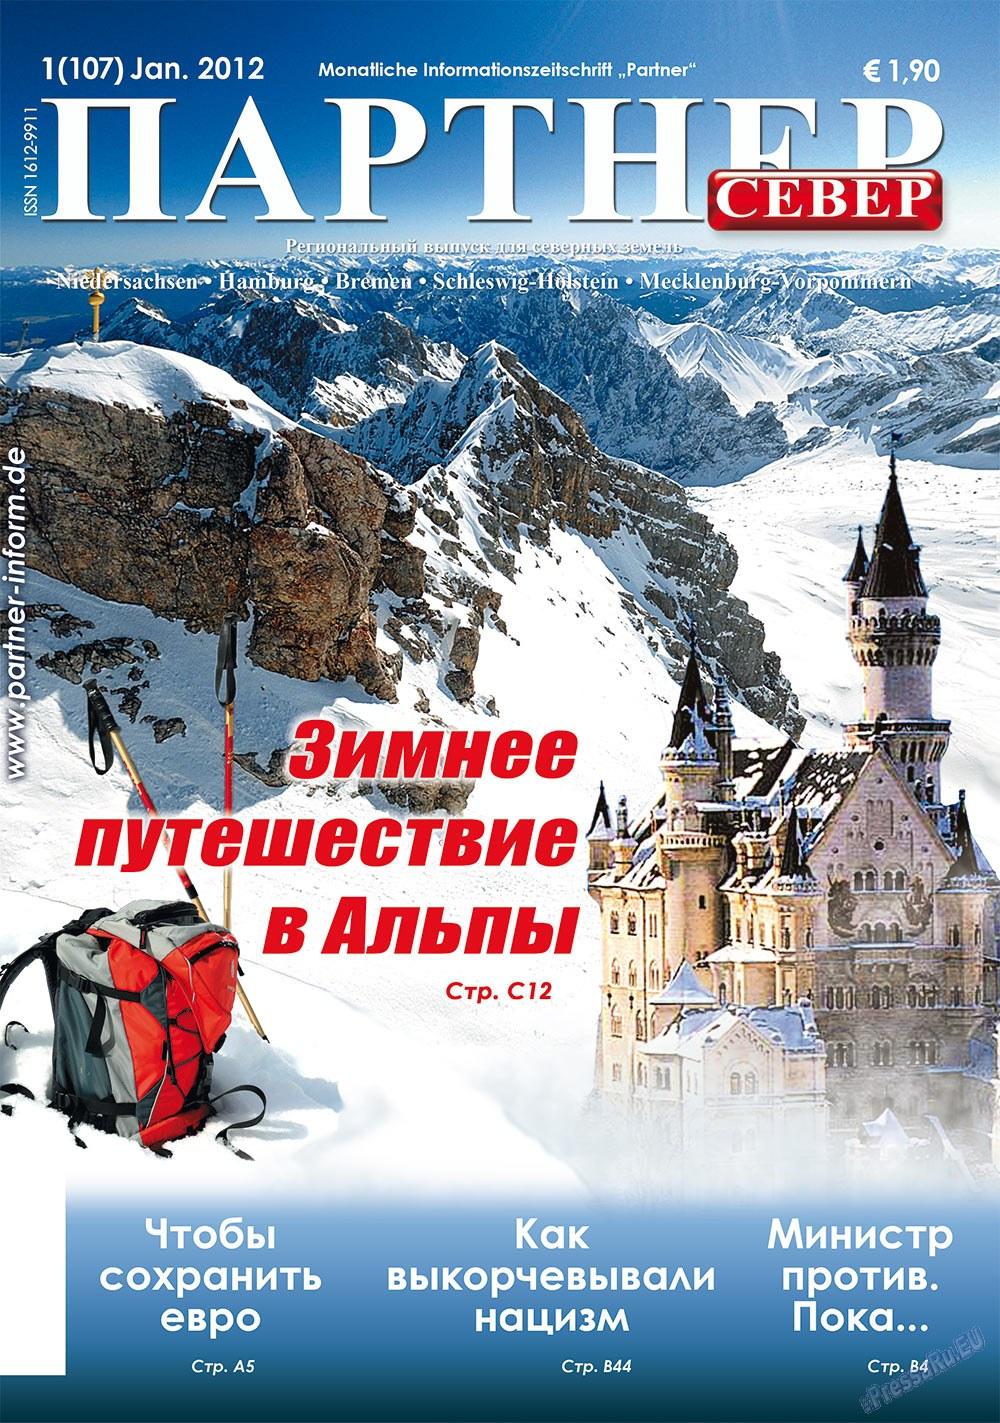 Партнер-север (журнал). 2012 год, номер 1, стр. 1